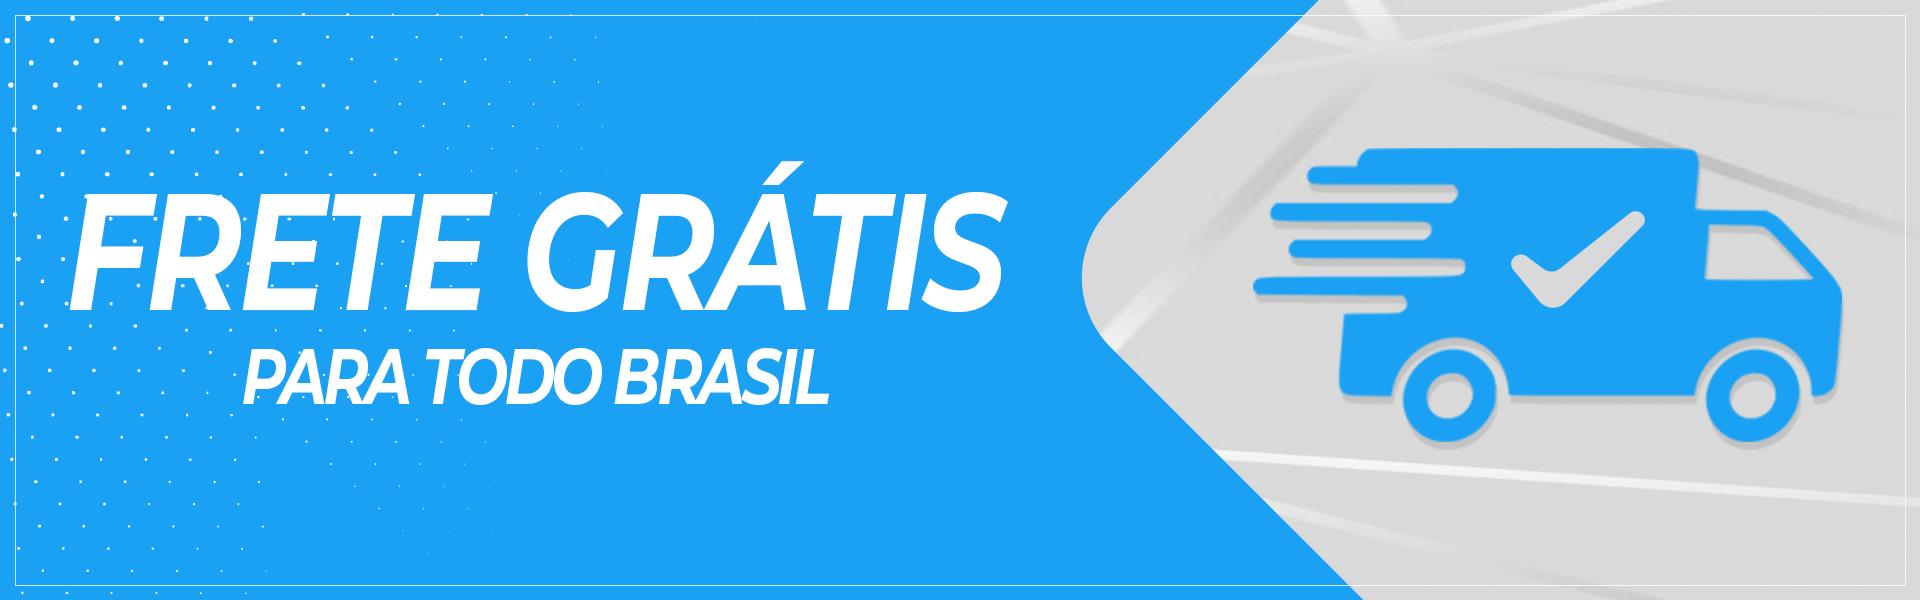 Banner Frete Grátis - @desktop